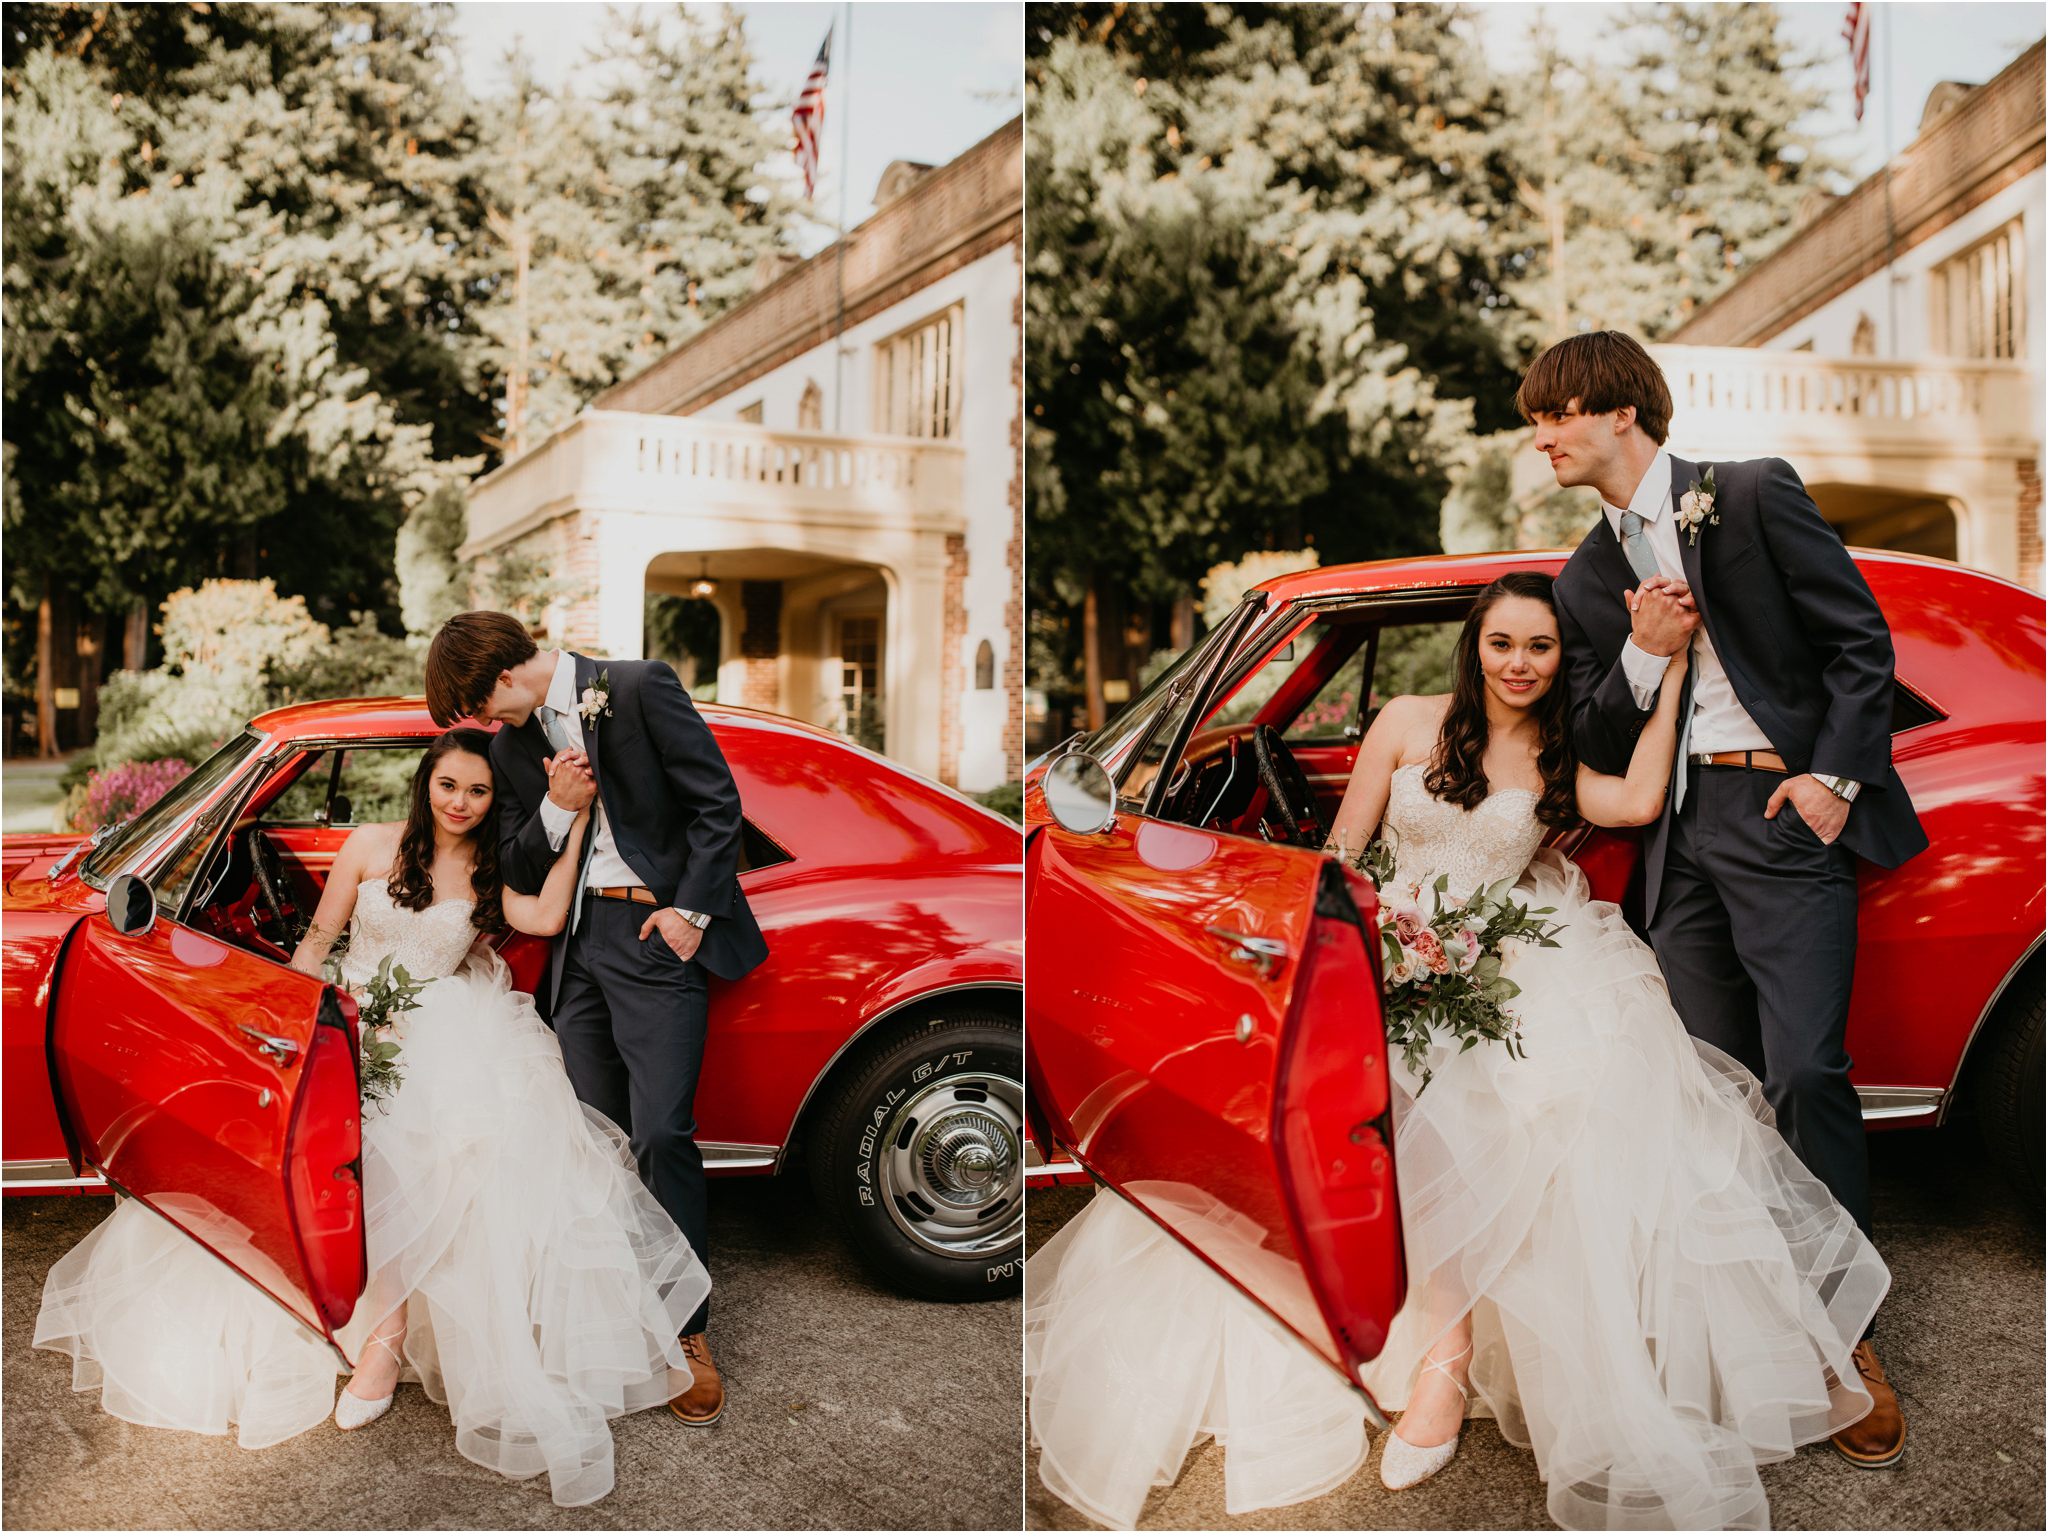 chance-and-ondrea-lairmont-manor-wedding-seattle-photographer-104.jpg